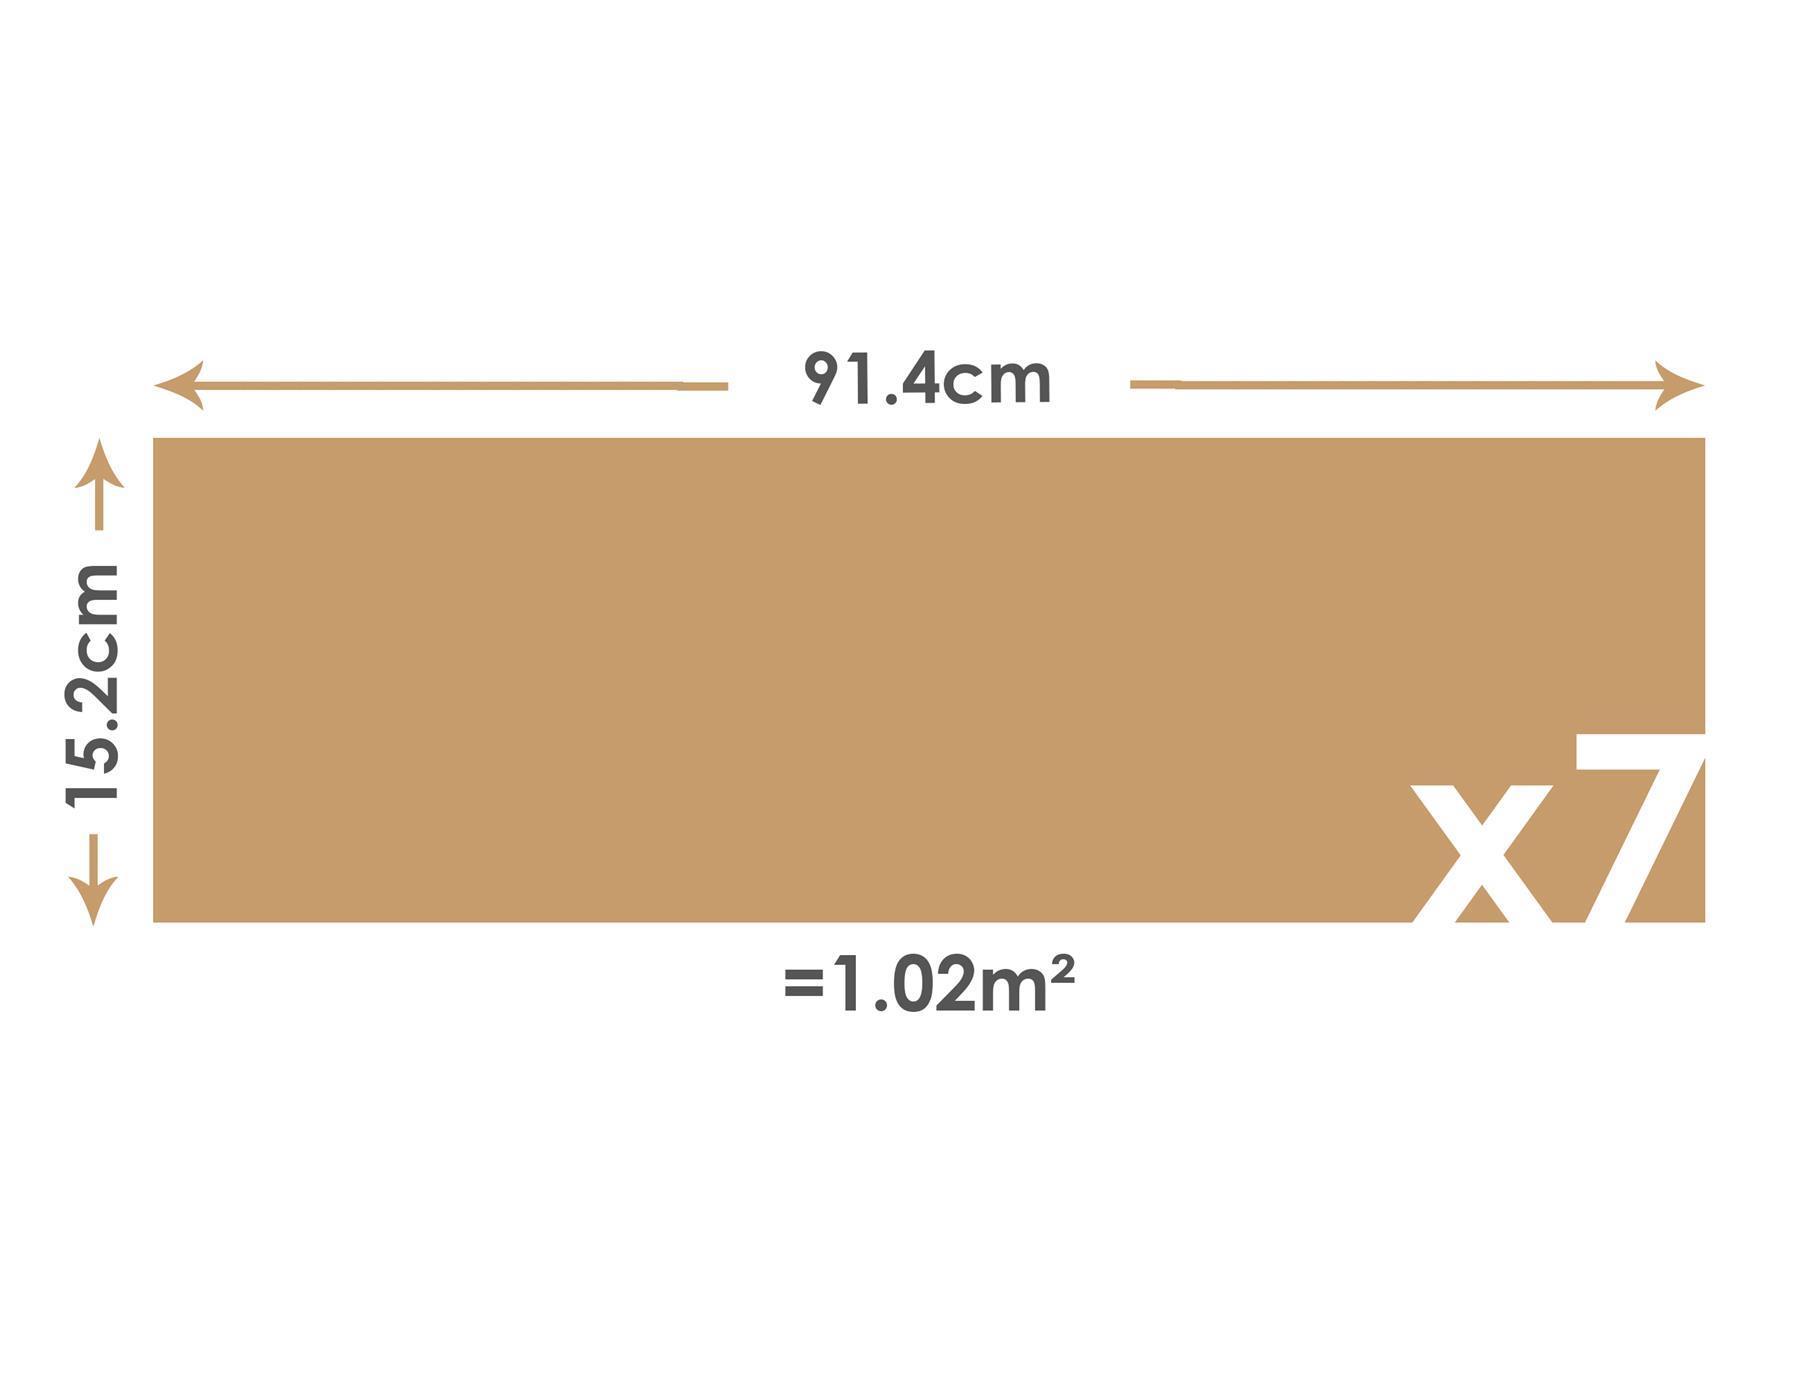 thumbnail 4 - Floor Planks Tiles Self Adhesive Dark Grey Wood Vinyl Flooring Kitchen Bathroom